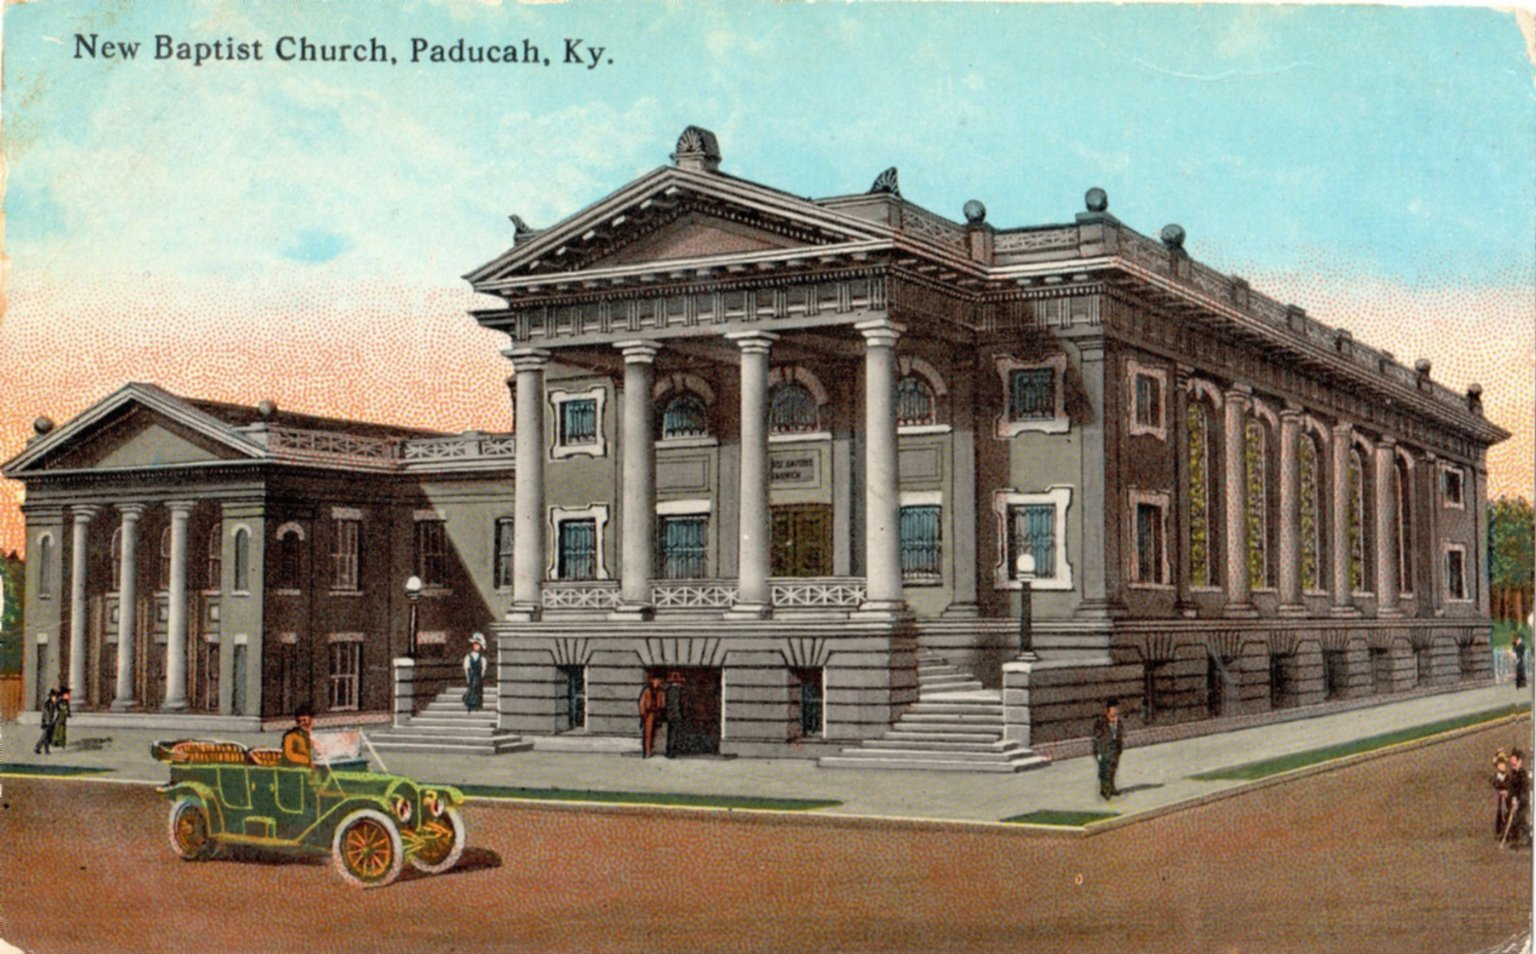 New Baptist Church, Paducah, KY